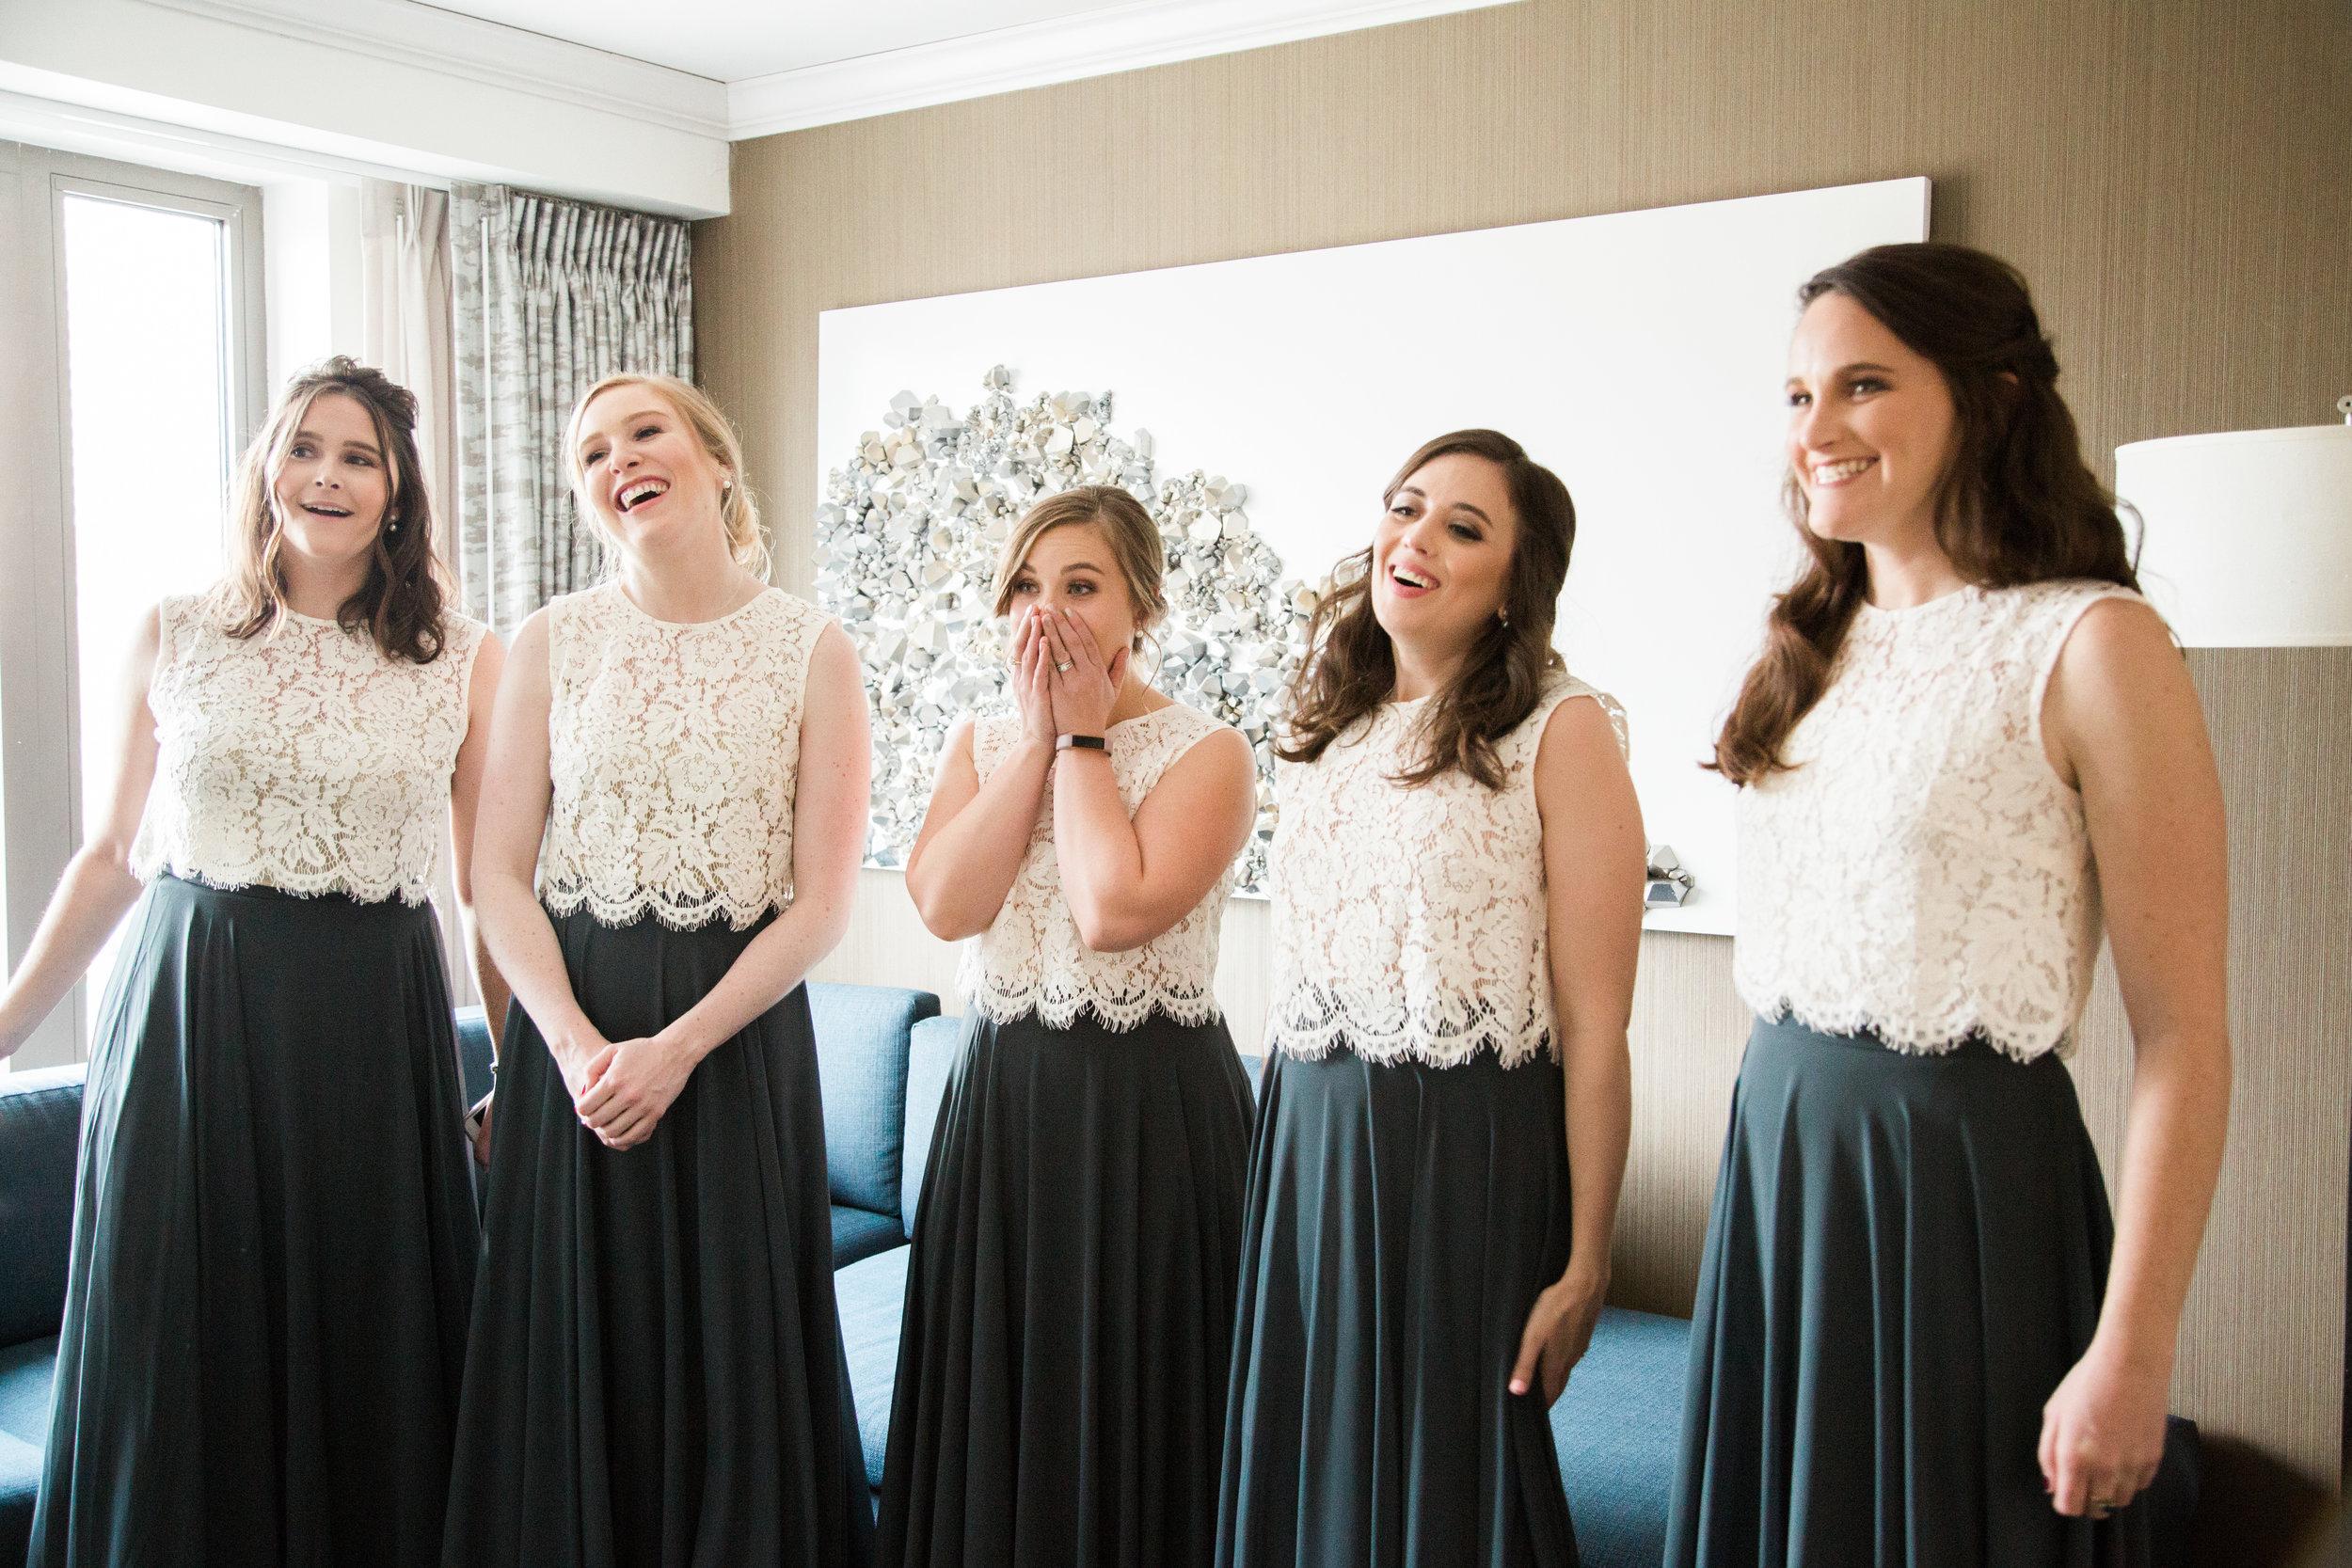 Hudson-Nichols-Martha-Stewart-Weddings-Winter-Ski-Philadelphia-Claire-Conner_029.jpg